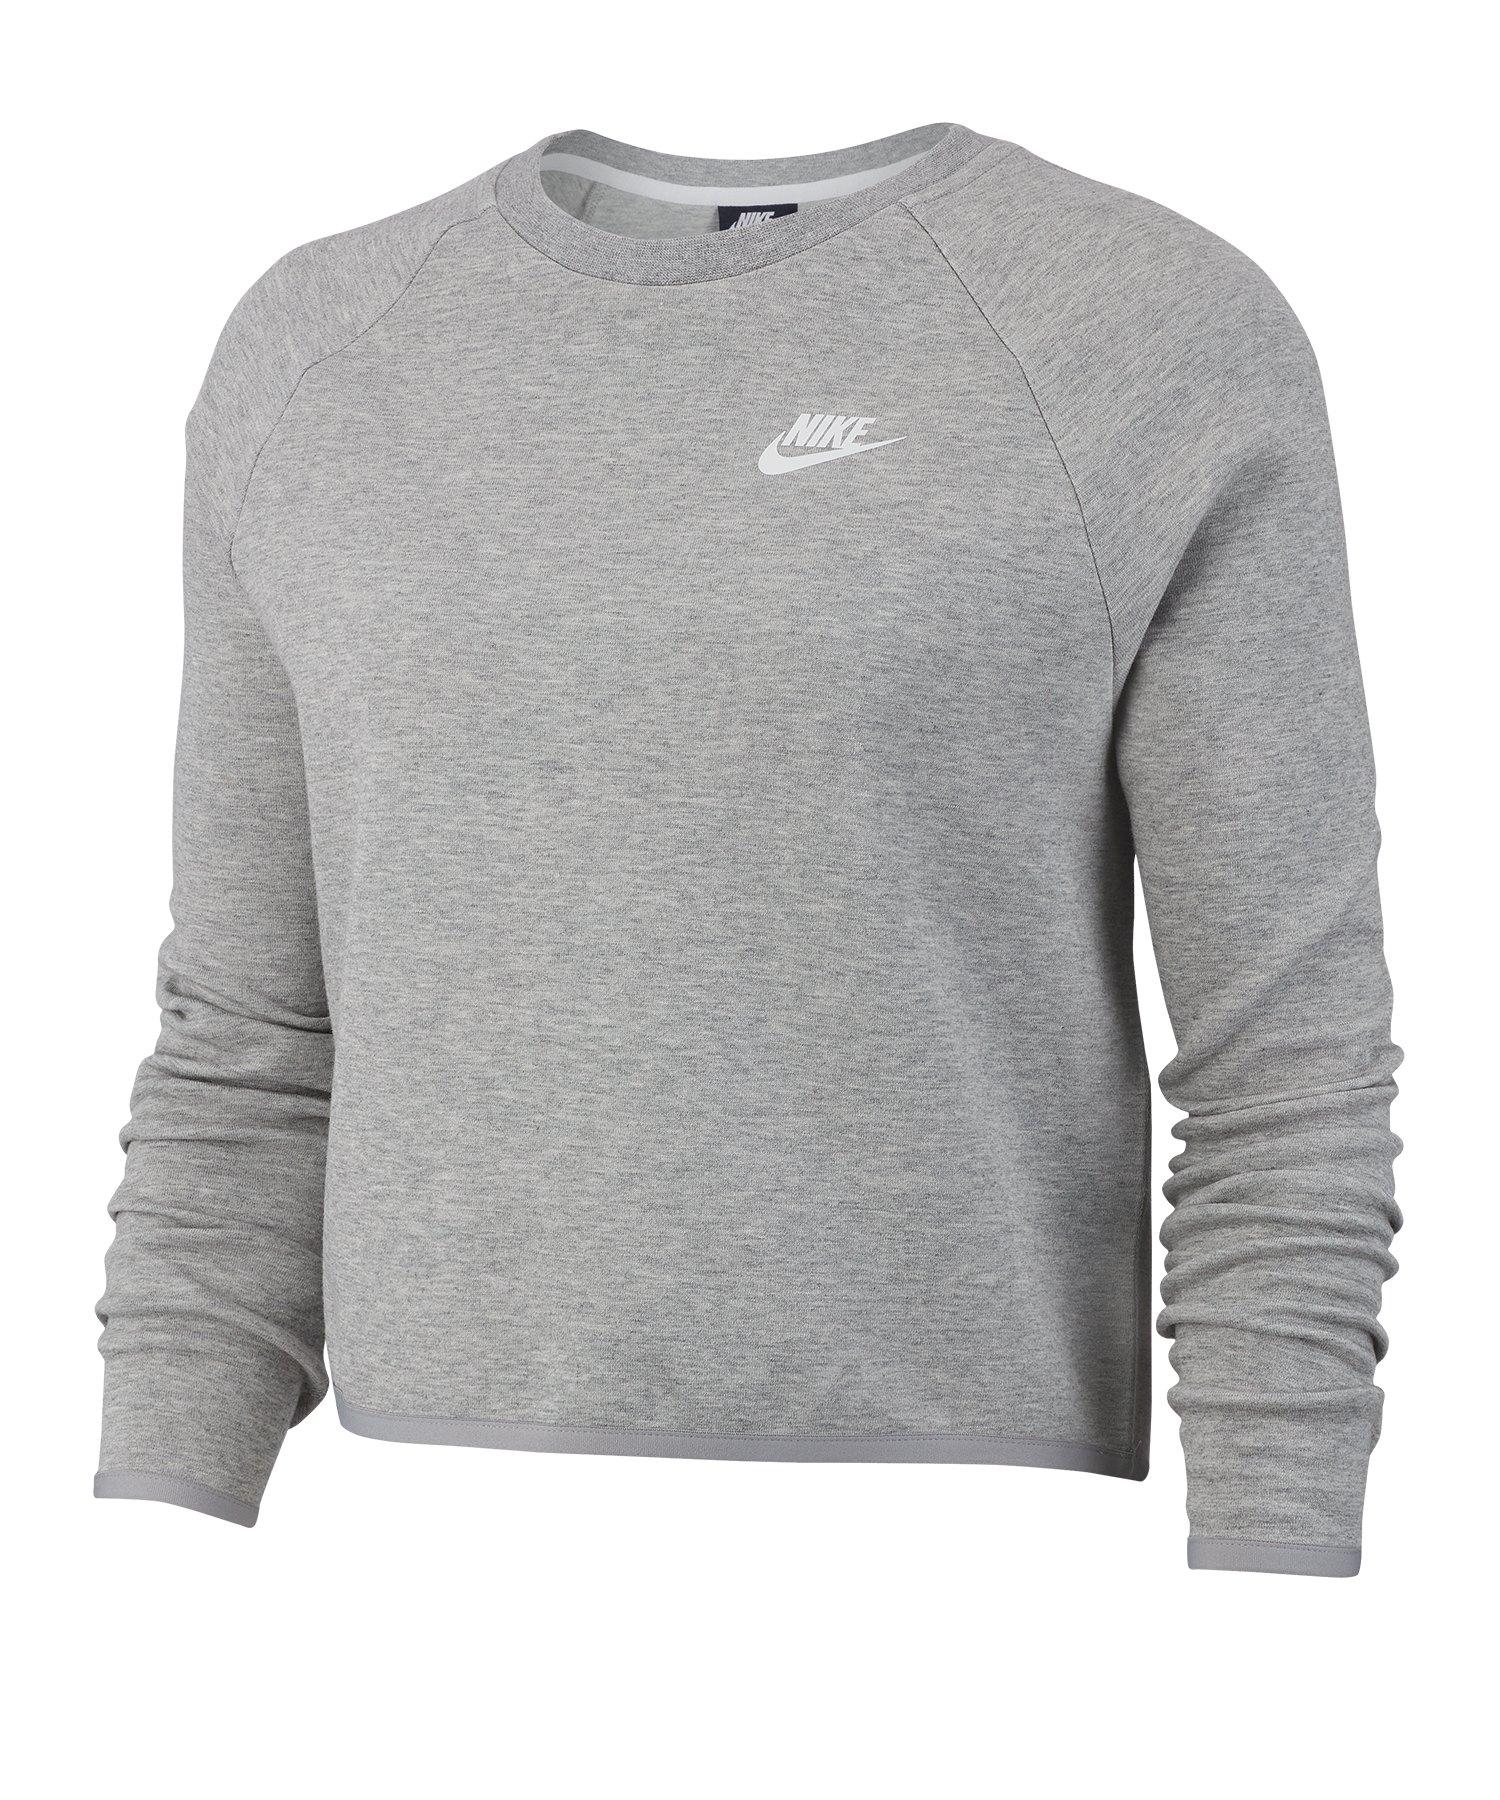 Nike Tech Crew Fleece Longsleeve Damen Grau F063 - grau